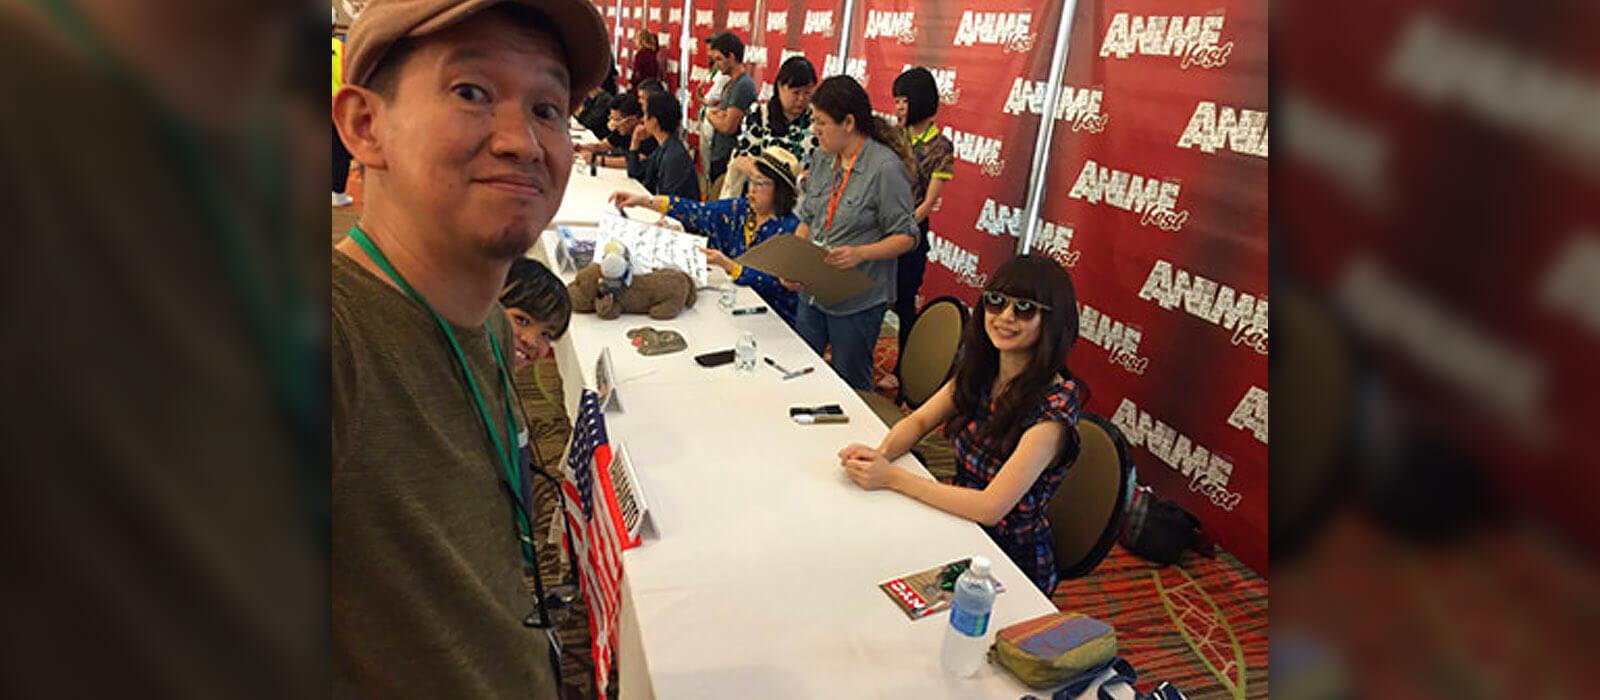 Hiramatsu taking a selfie with Yamamoto and Kubo during AnimeFest